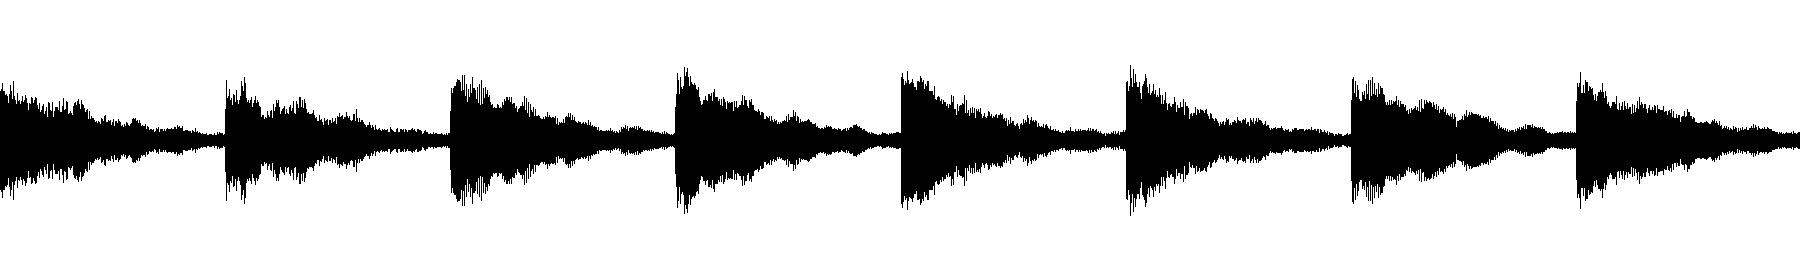 vedh melodyloop 011 bm dmaj7 a g 124bpm